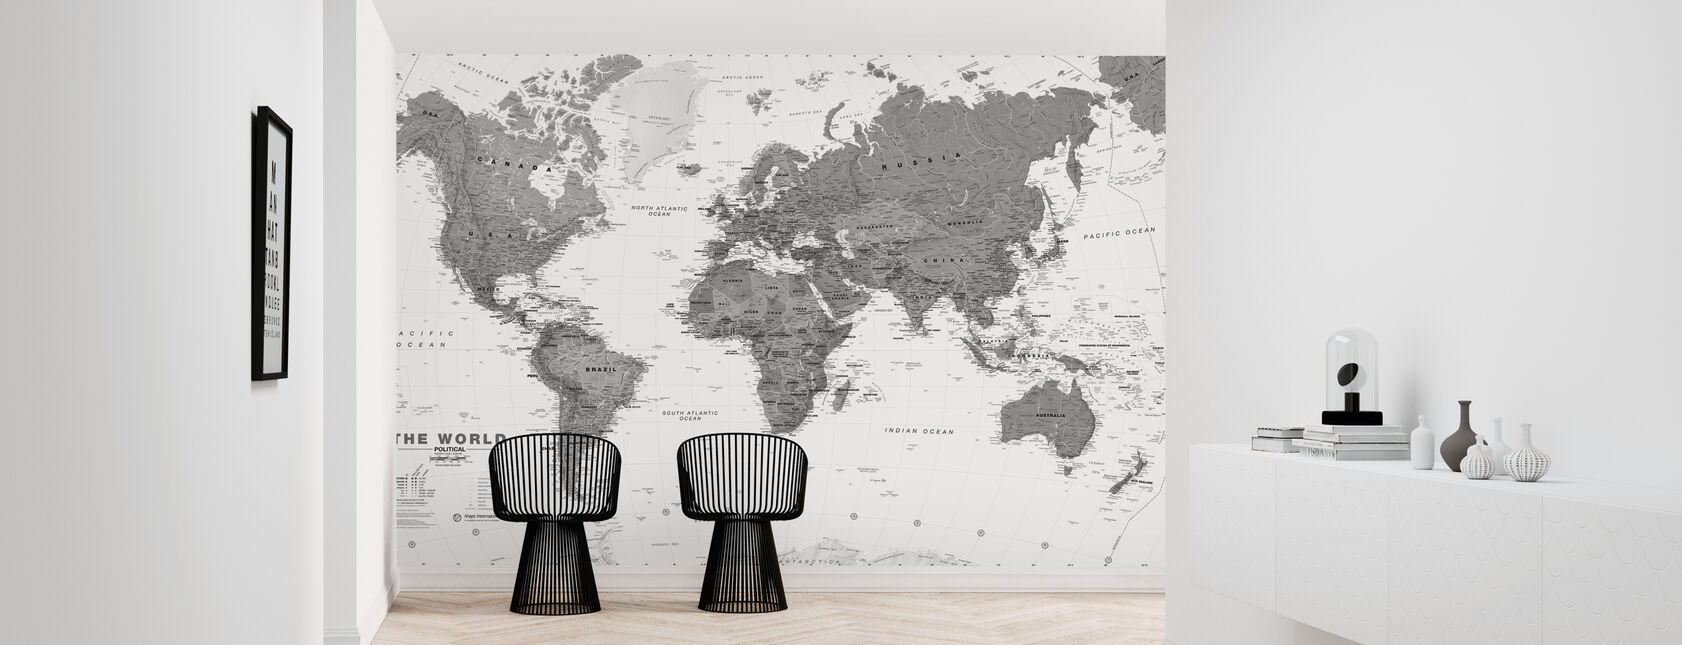 World Map Bw - Wallpaper - Hallway